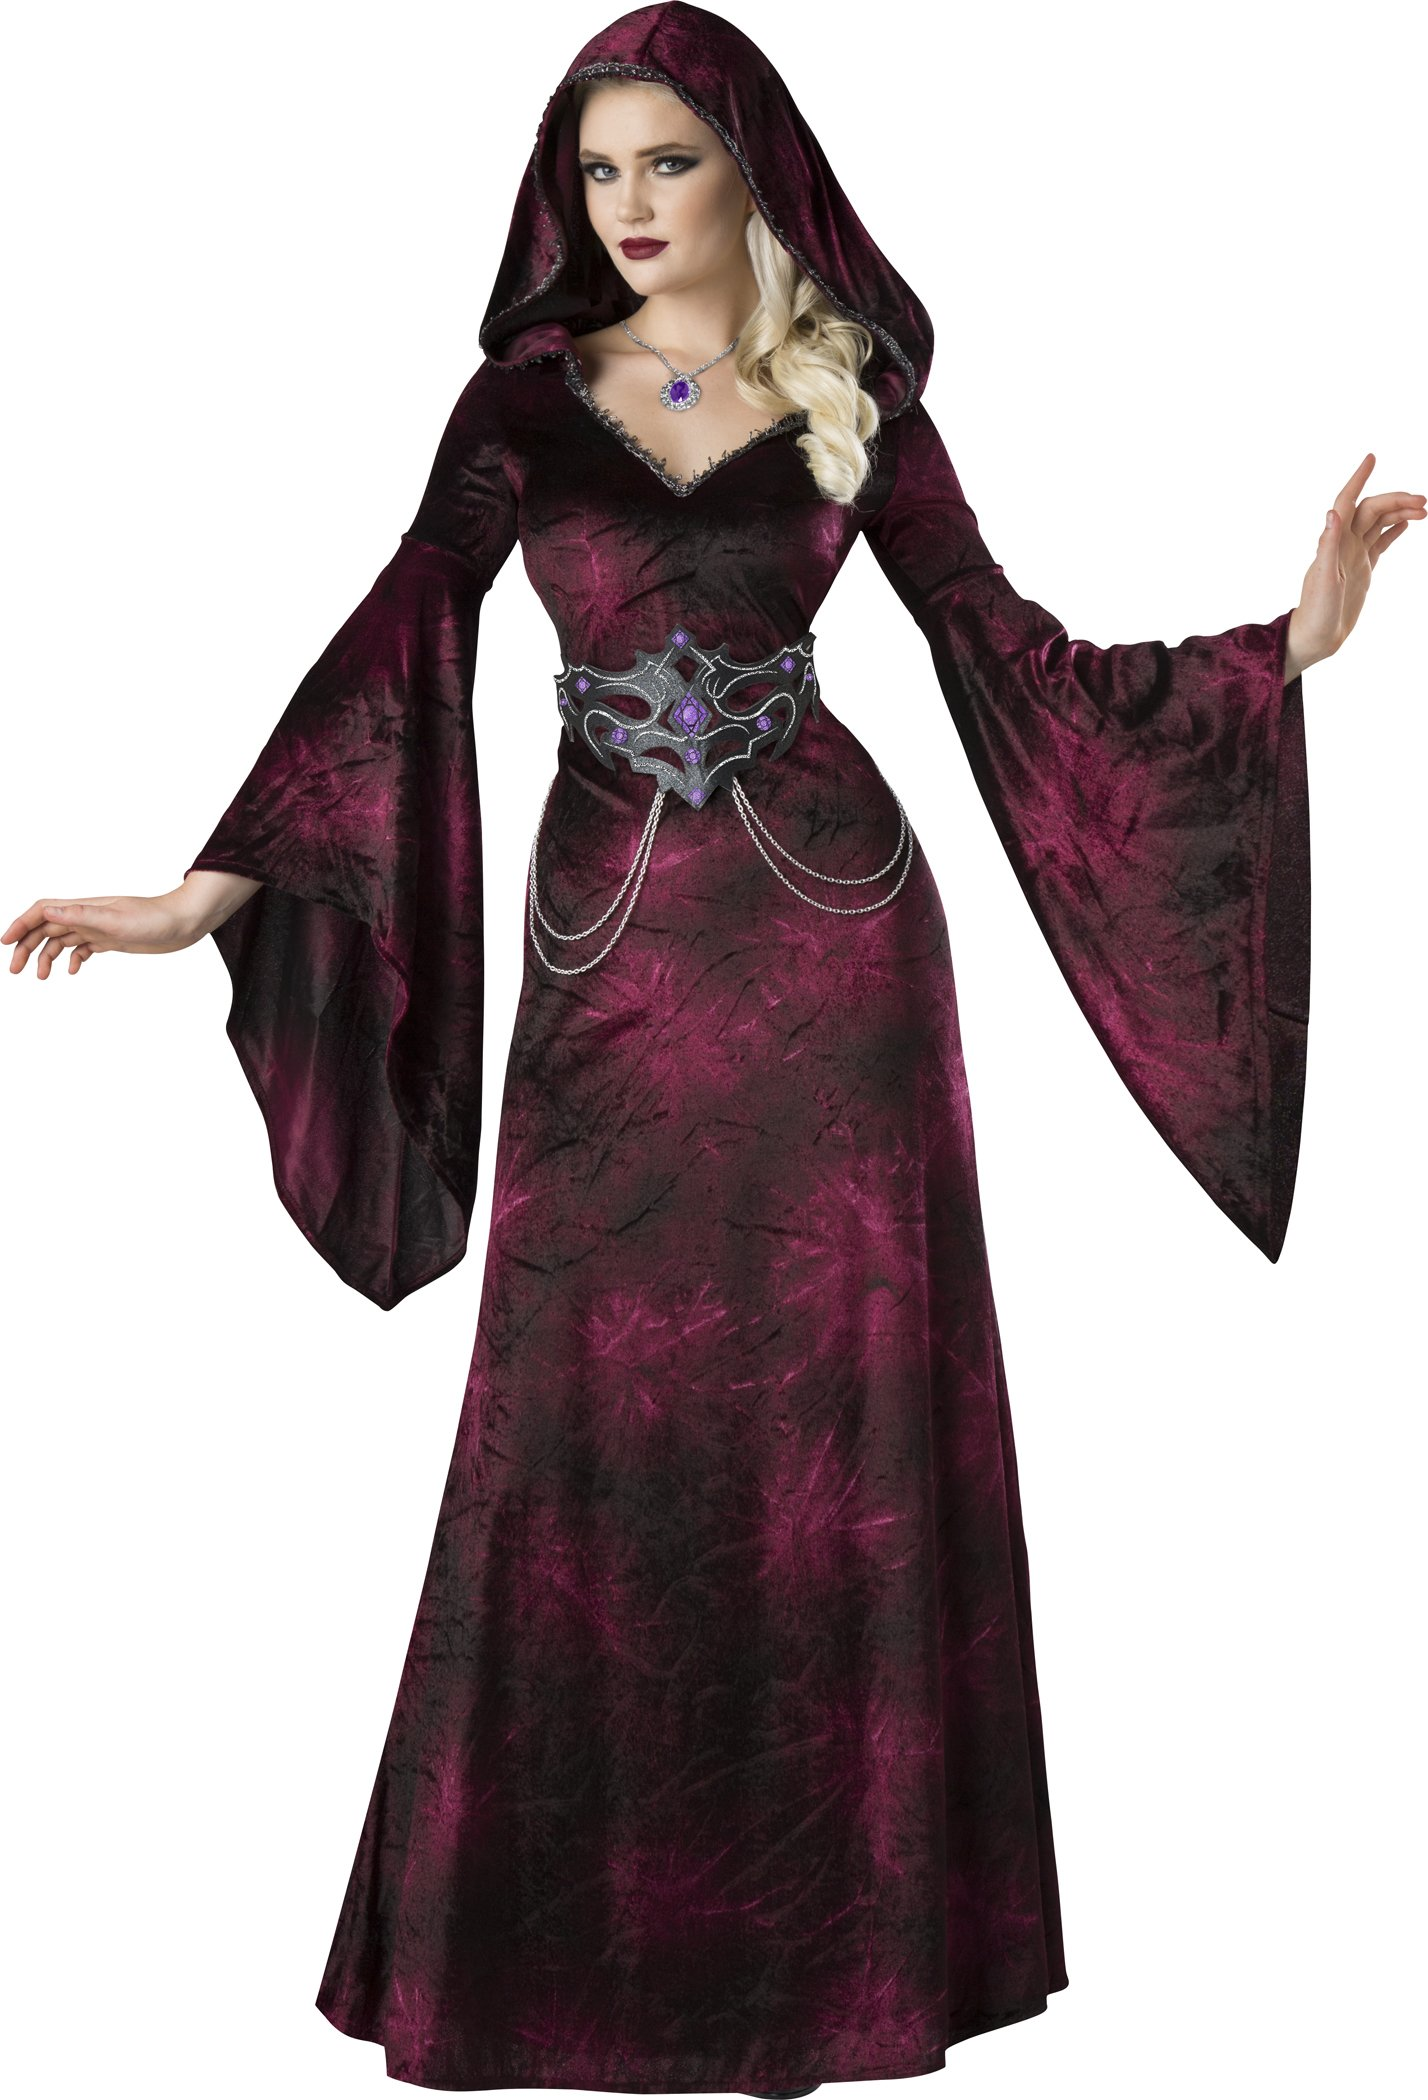 Fun World Women's Dark Realm Sorceress, Burgundy/Black, L